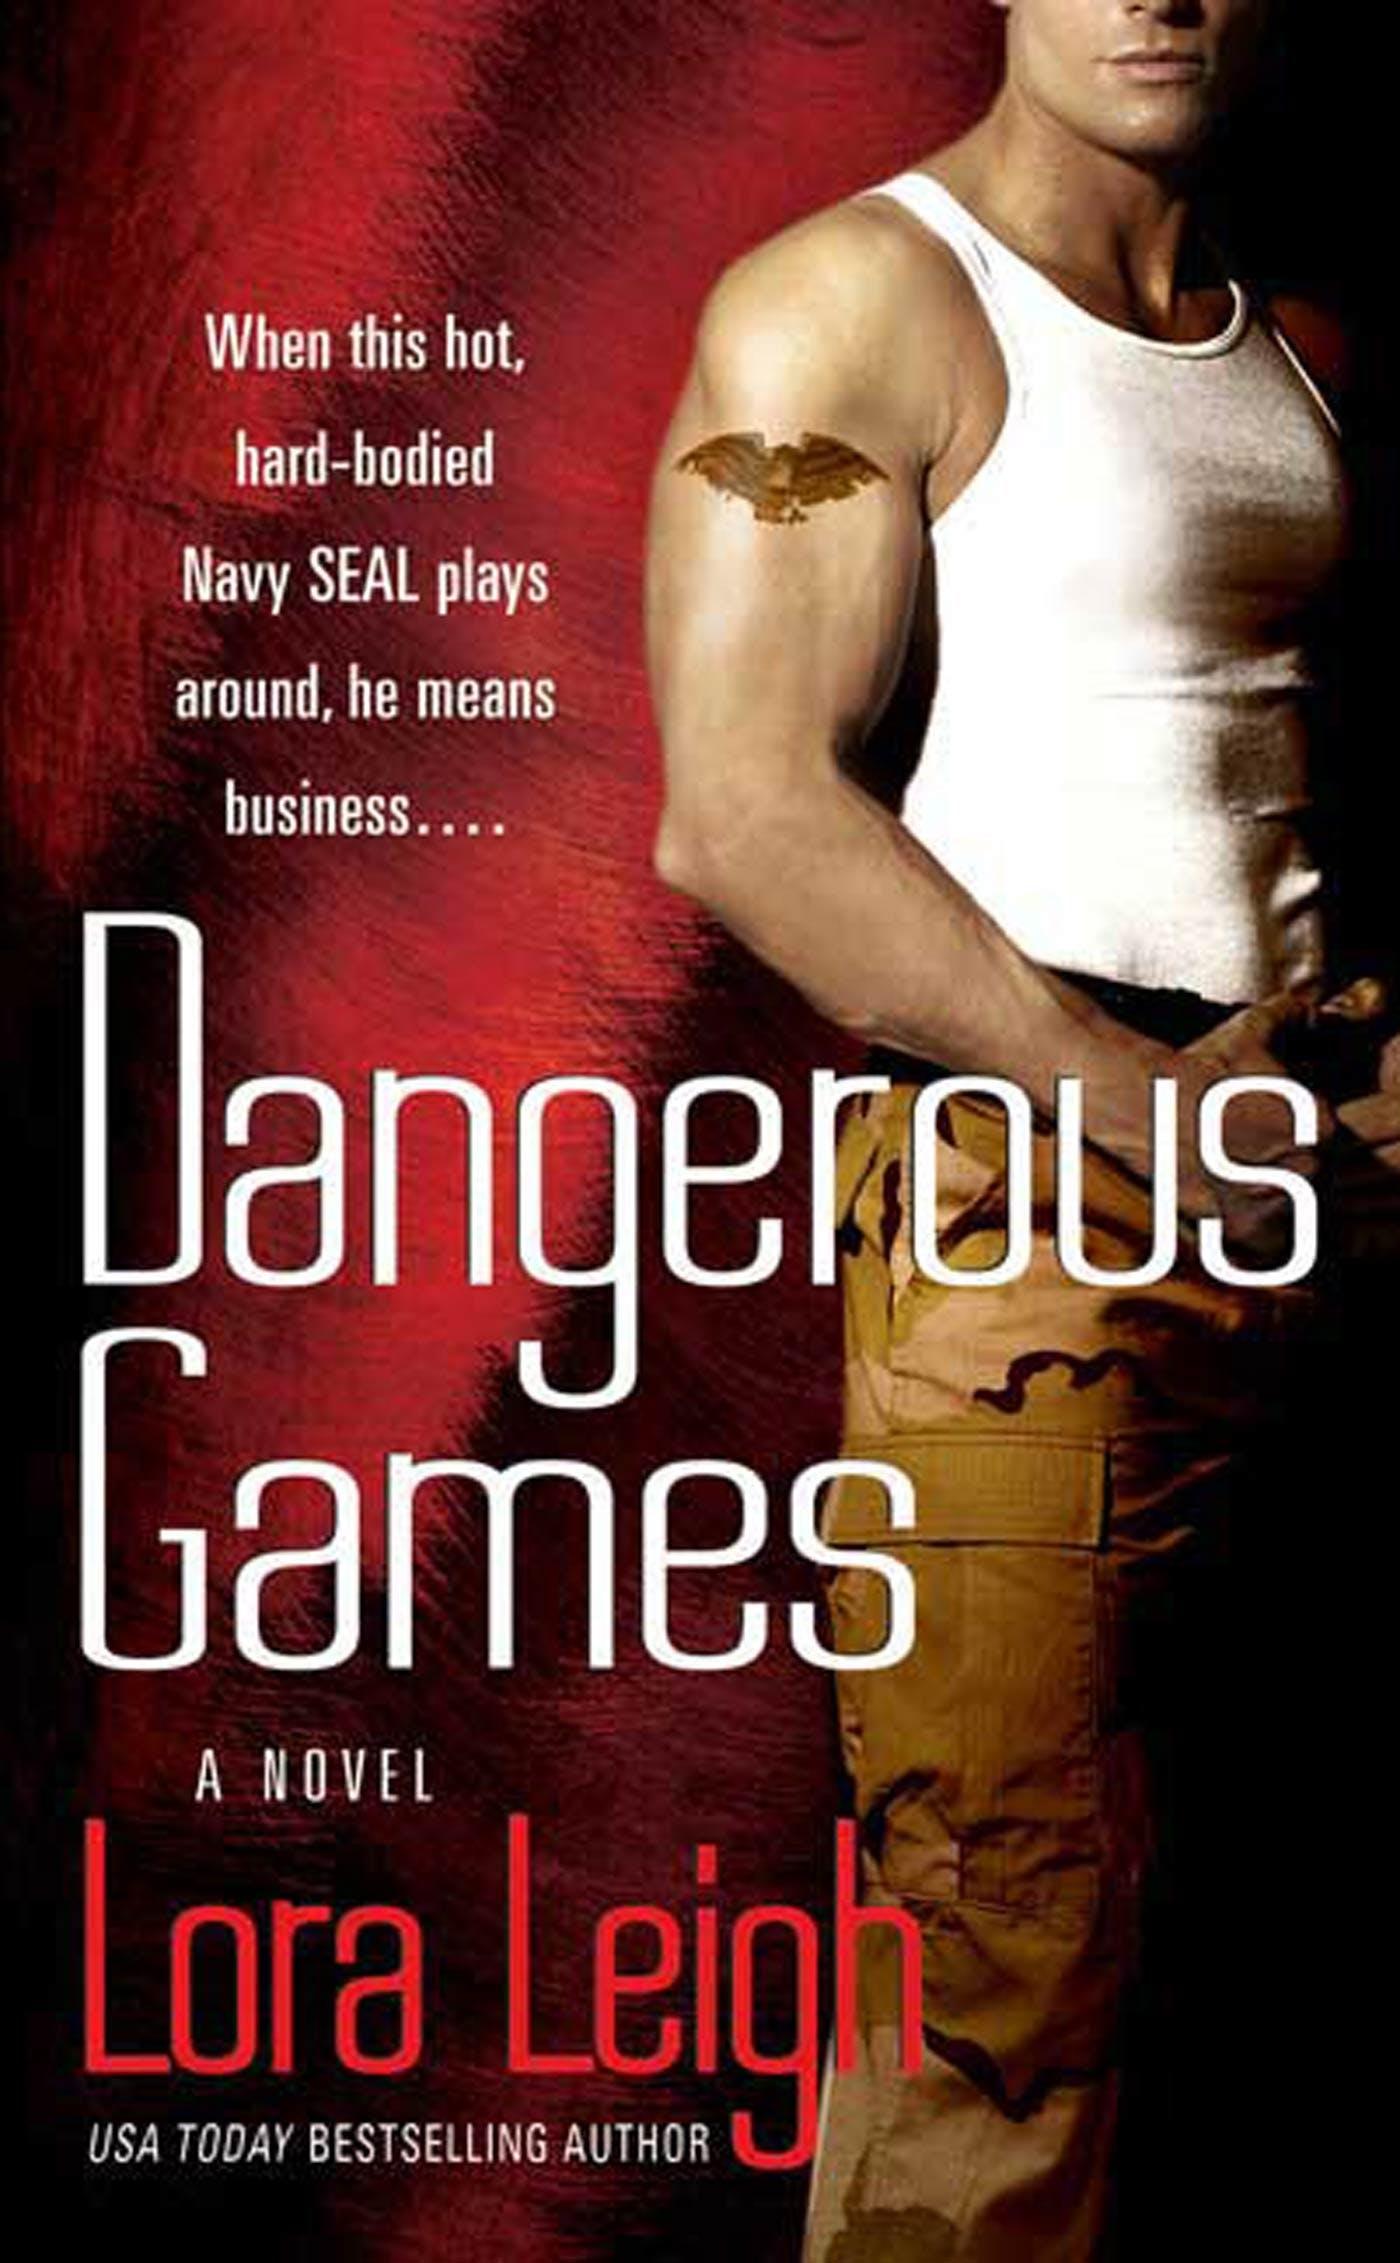 Image of Dangerous Games